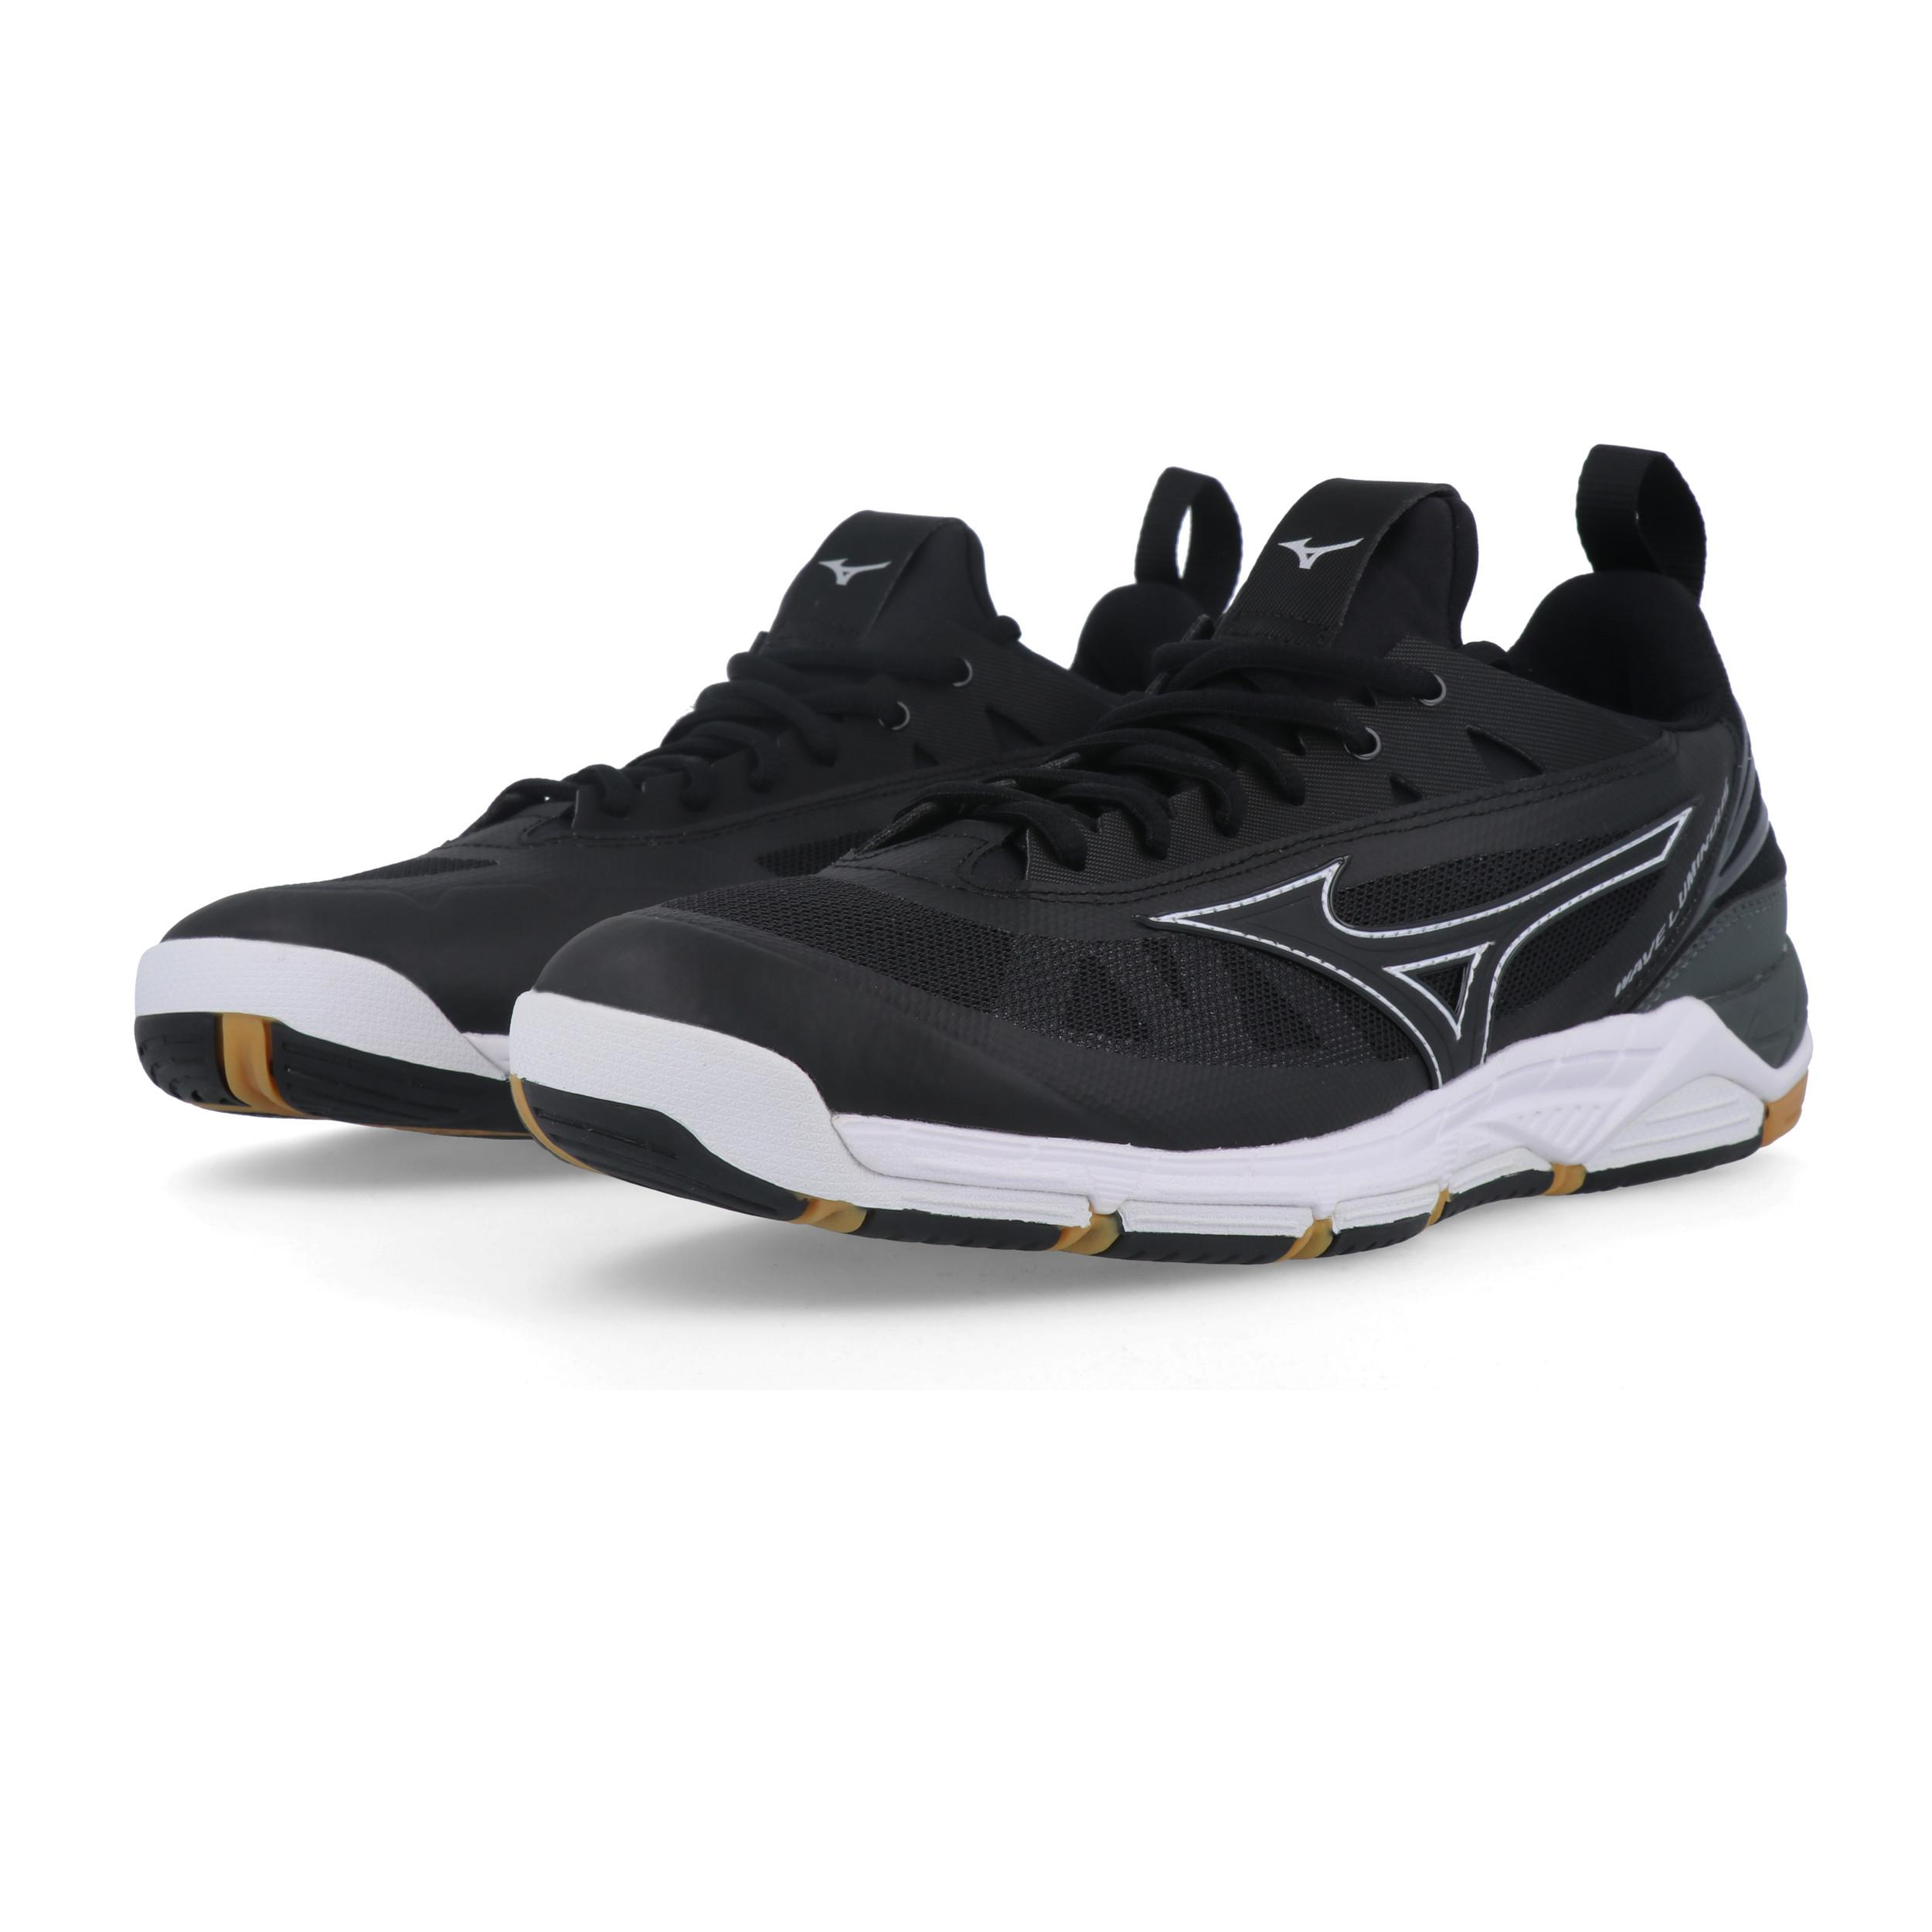 Mizuno Wave Luminous Indoor Court Shoes